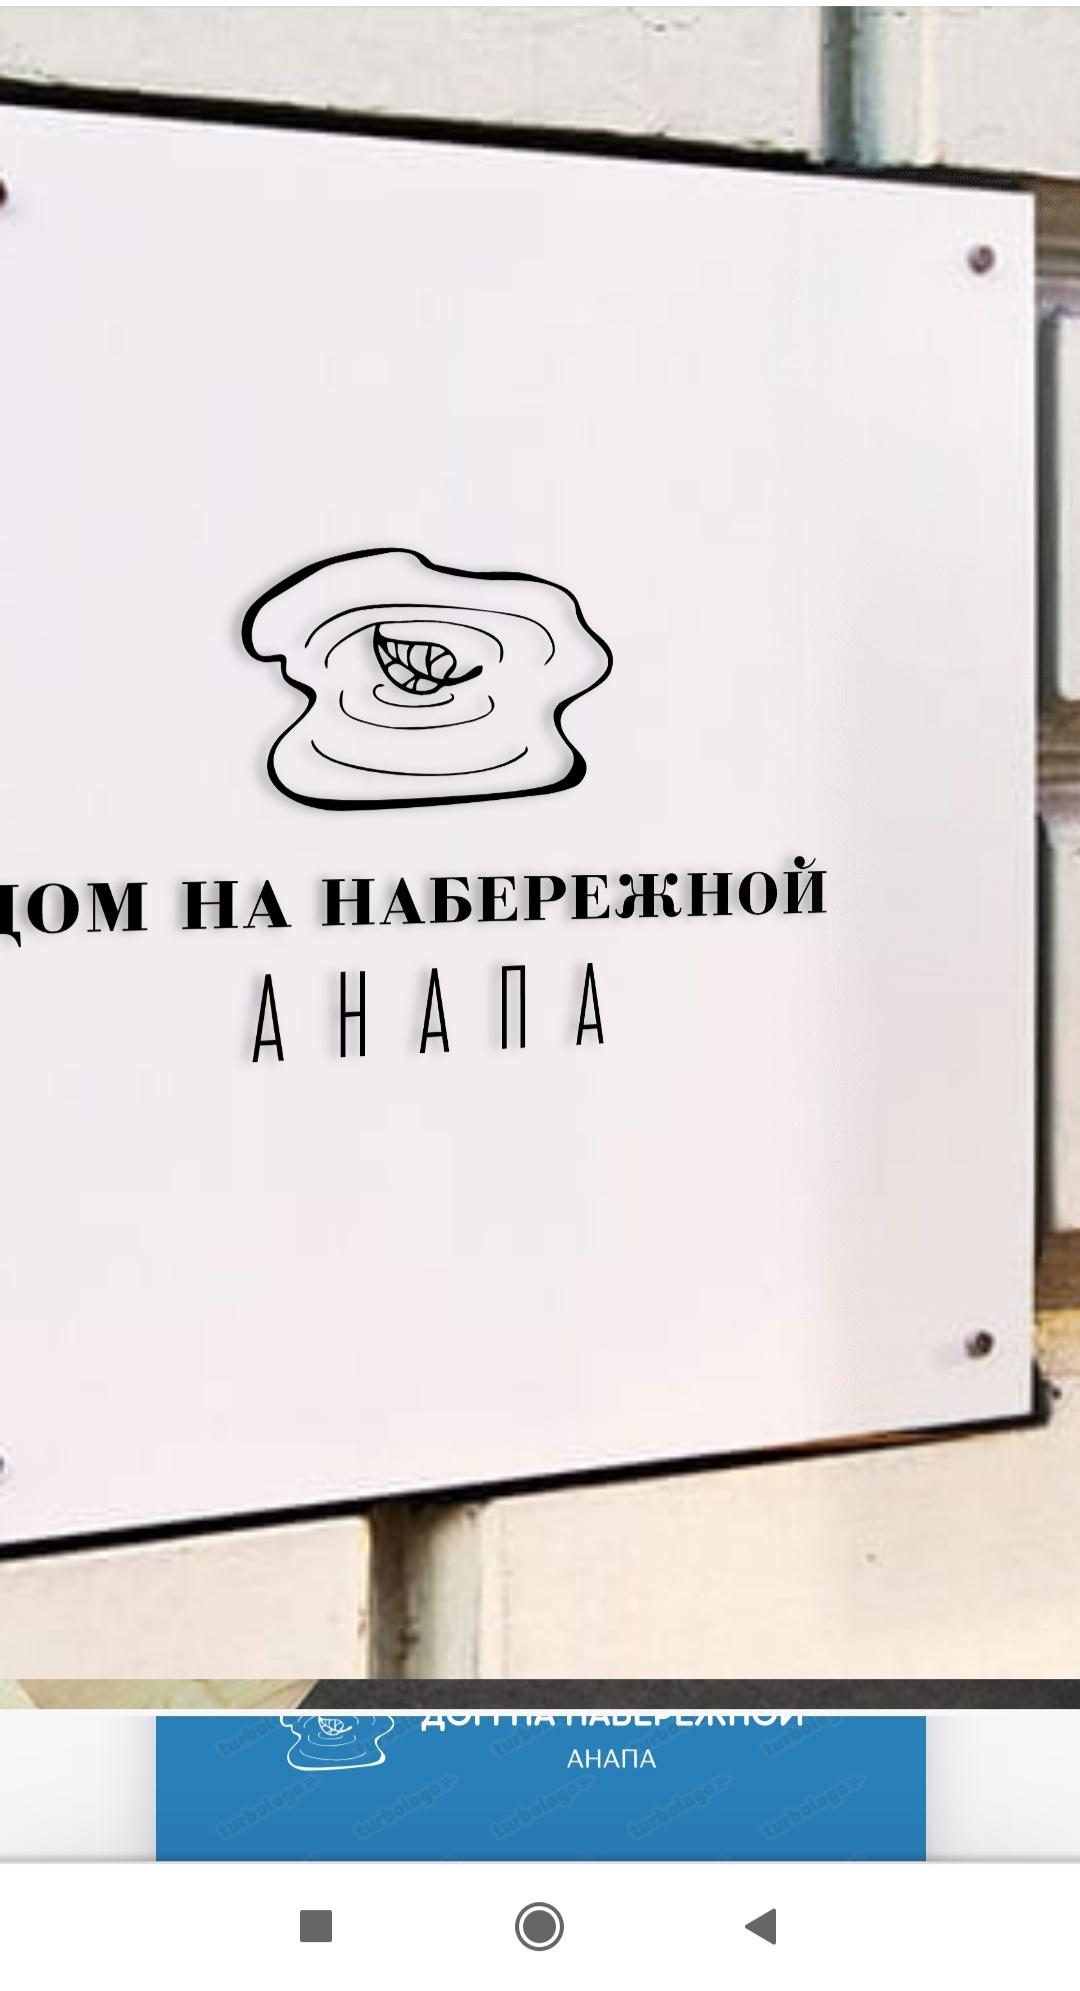 РАЗРАБОТКА логотипа для ЖИЛОГО КОМПЛЕКСА премиум В АНАПЕ.  фото f_8435deac5a1eb145.jpg